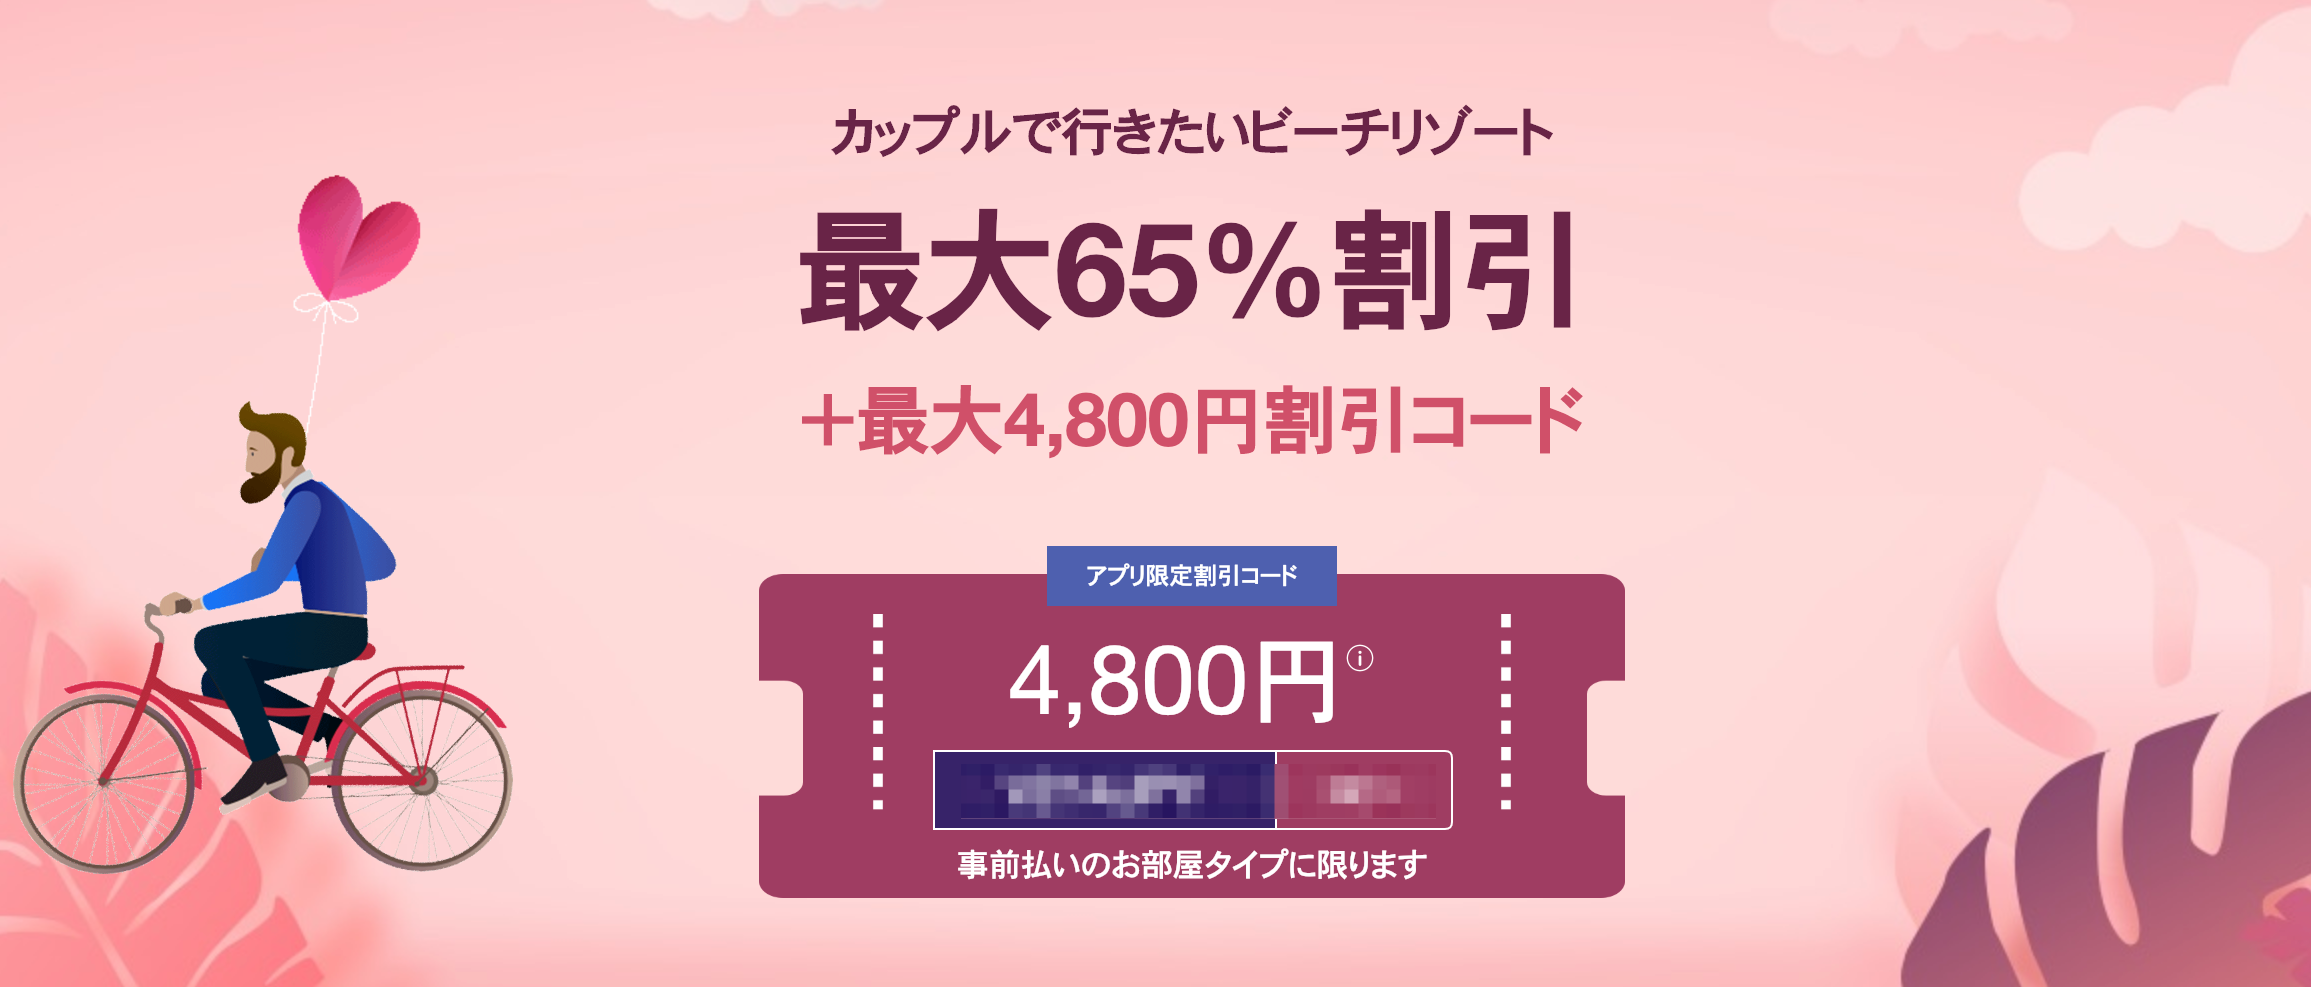 Trip.com(旧Ctrip)の海外ホテル予約が最大65%割引&4,800円割引クーポン